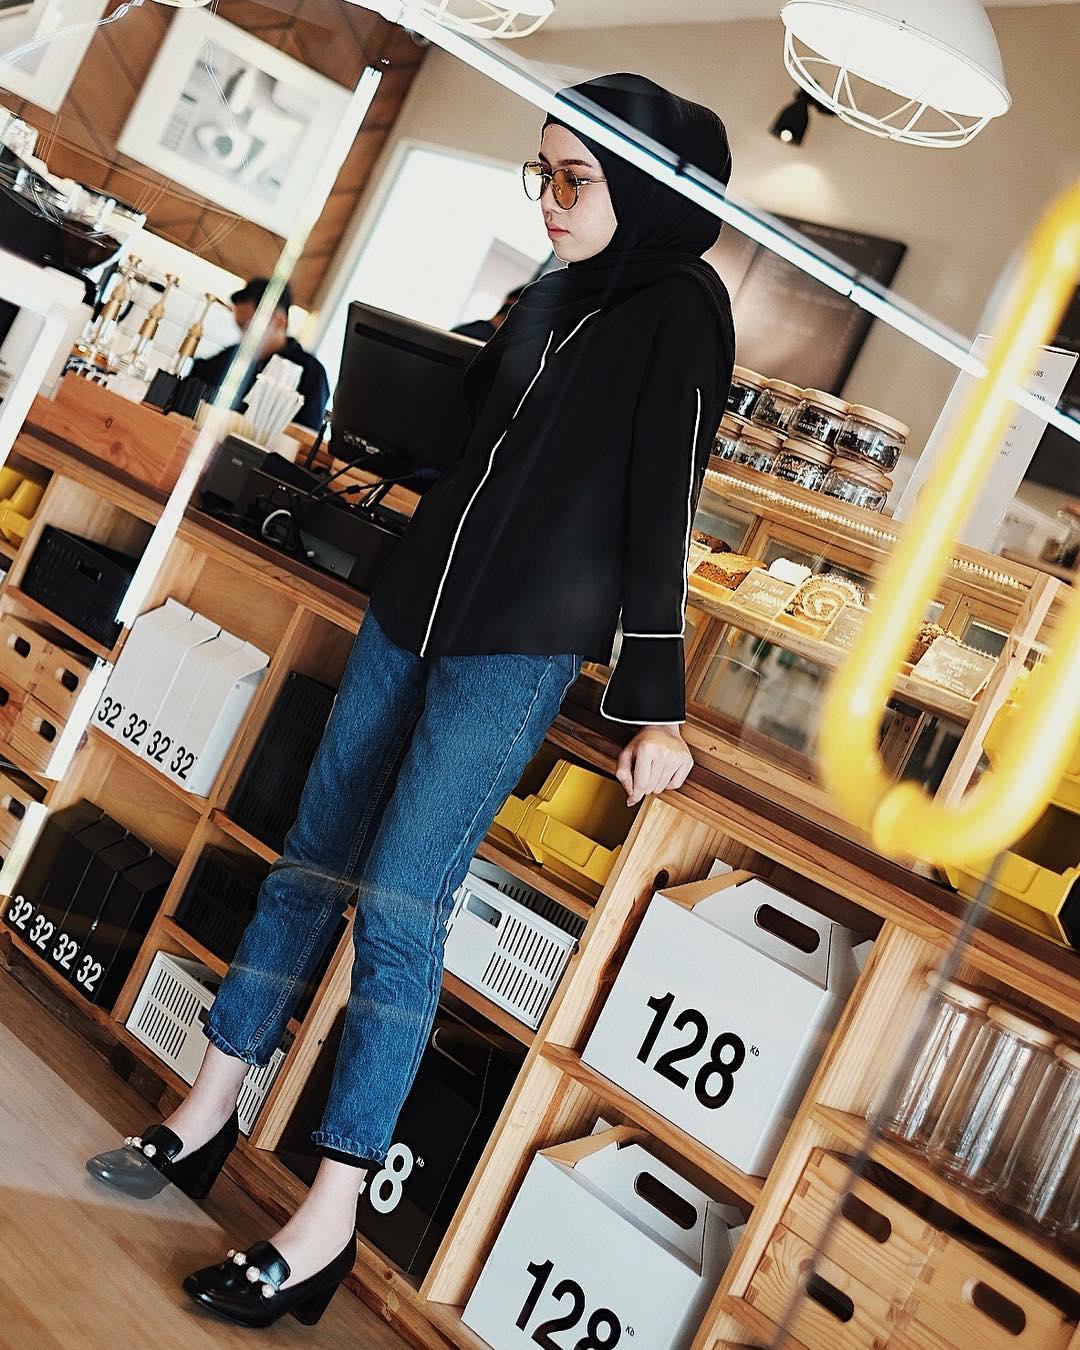 OOTD Baju Hijab Kekinian Ala Selebgram 2018 wedges heels pashmina ciput daleman kerudung top blouse shirt kemeja hitam garis putih sunglasses kacamata bulat gold pants jegging denim longpants jeans biru tua blue ootd outfit kekinian 2018 selebgram